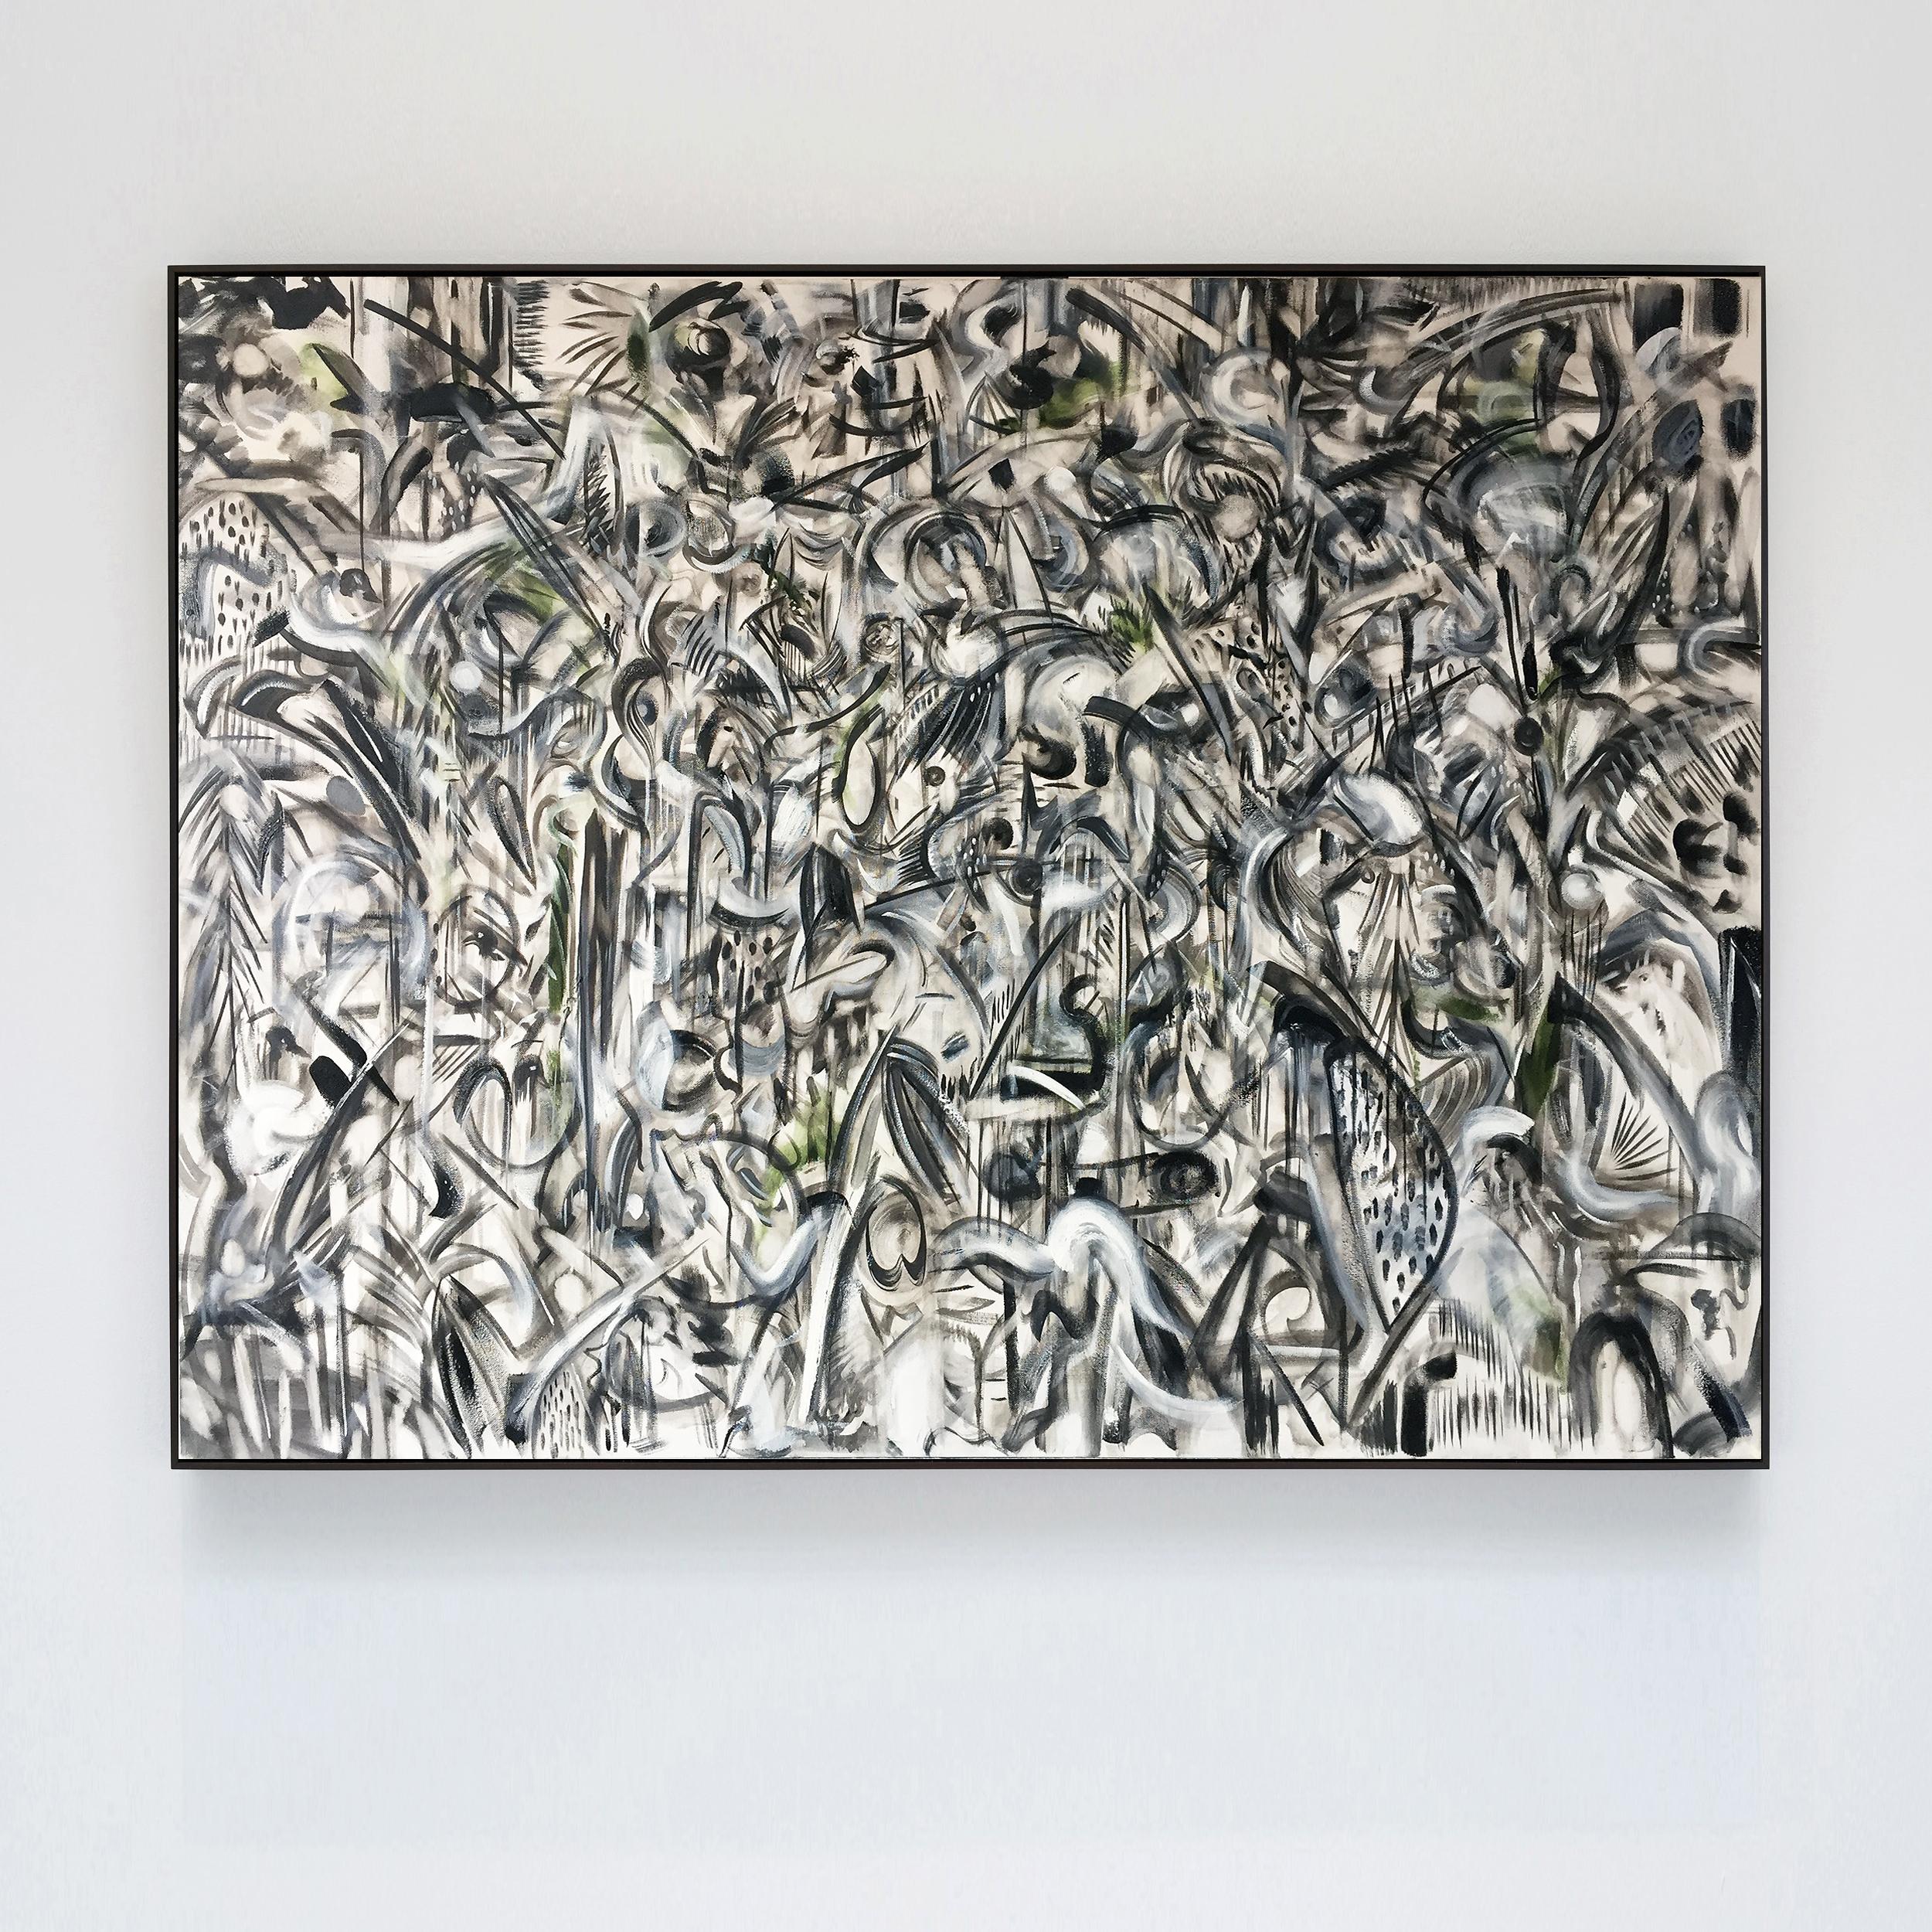 his key monochrome 2018 oil, oil stick on canvas, with ivy overprint, tulip wood moulding, dark oak finish, 94x124x4cm